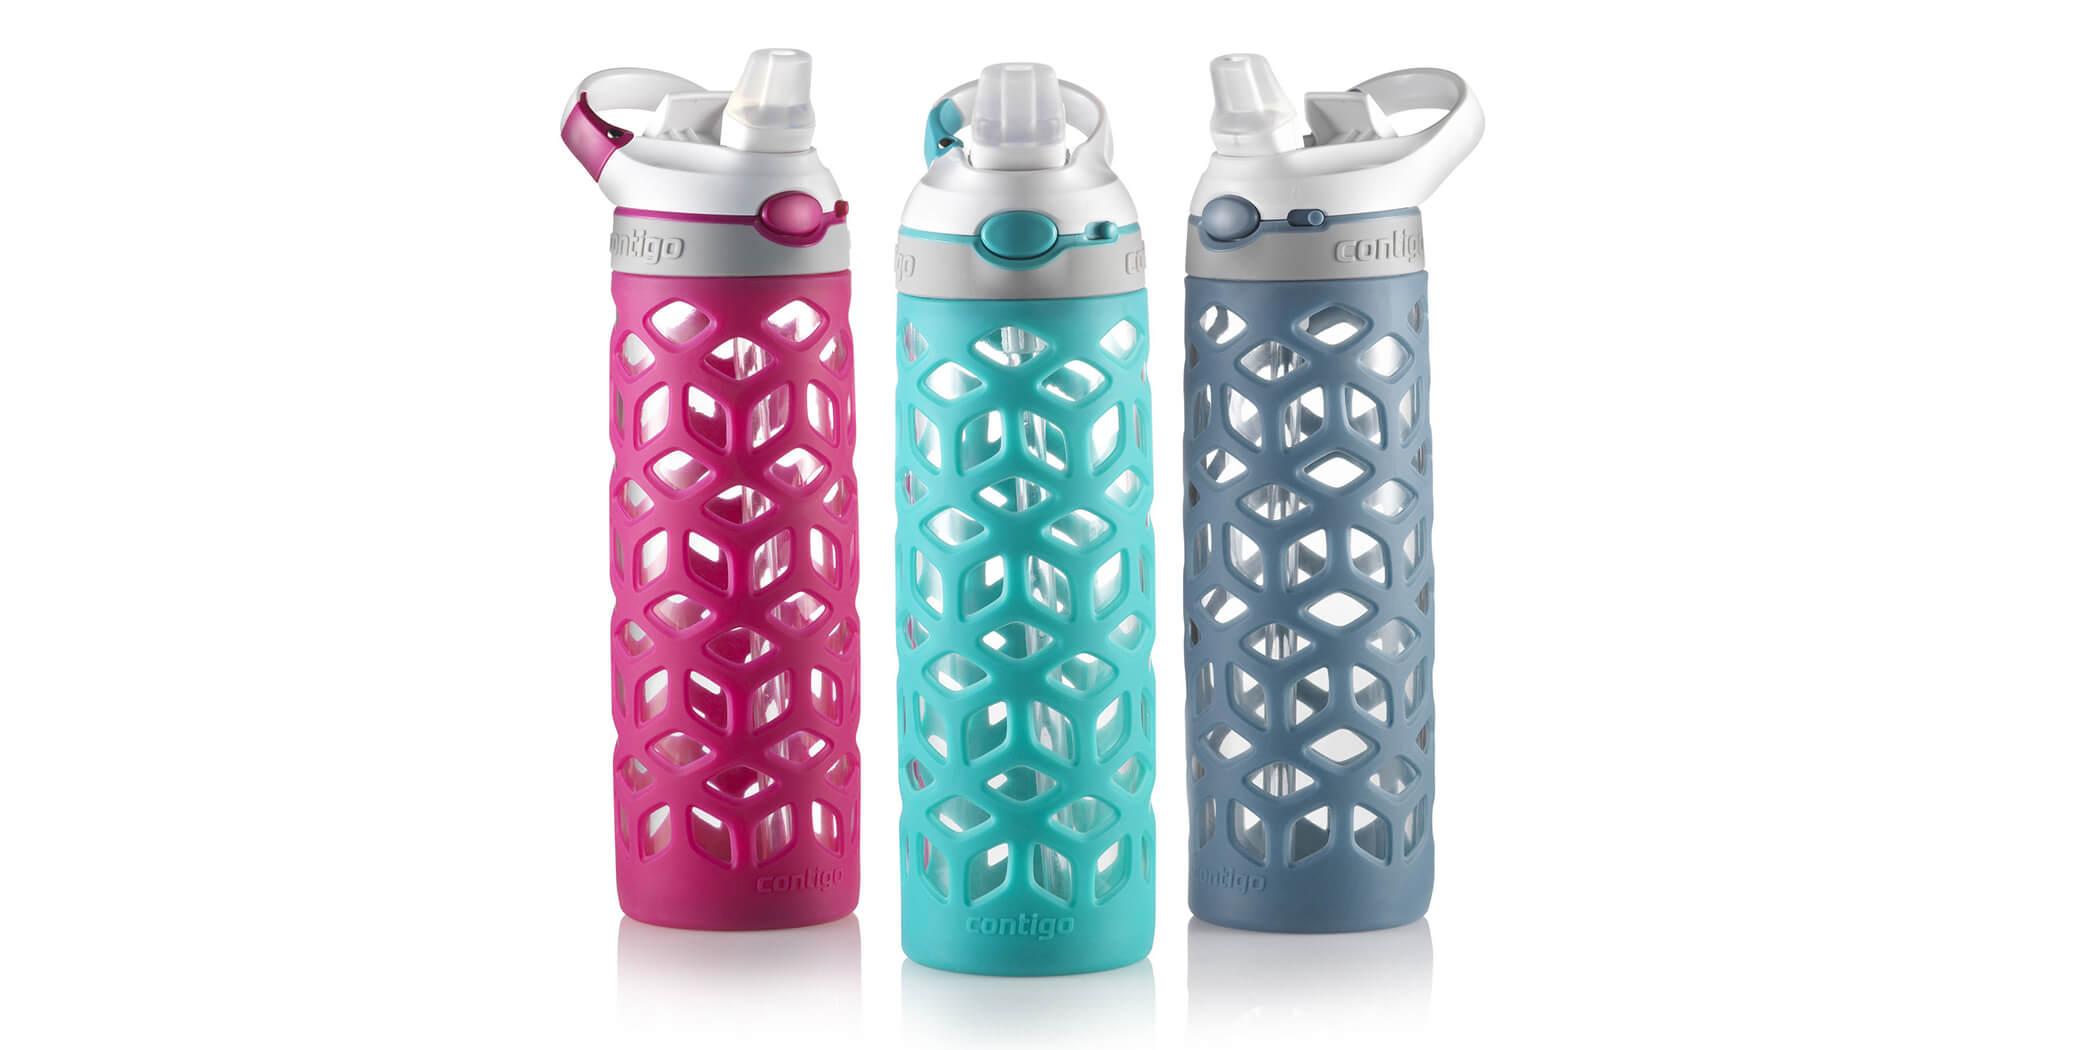 contigo-glass-water-bottle-with-straw